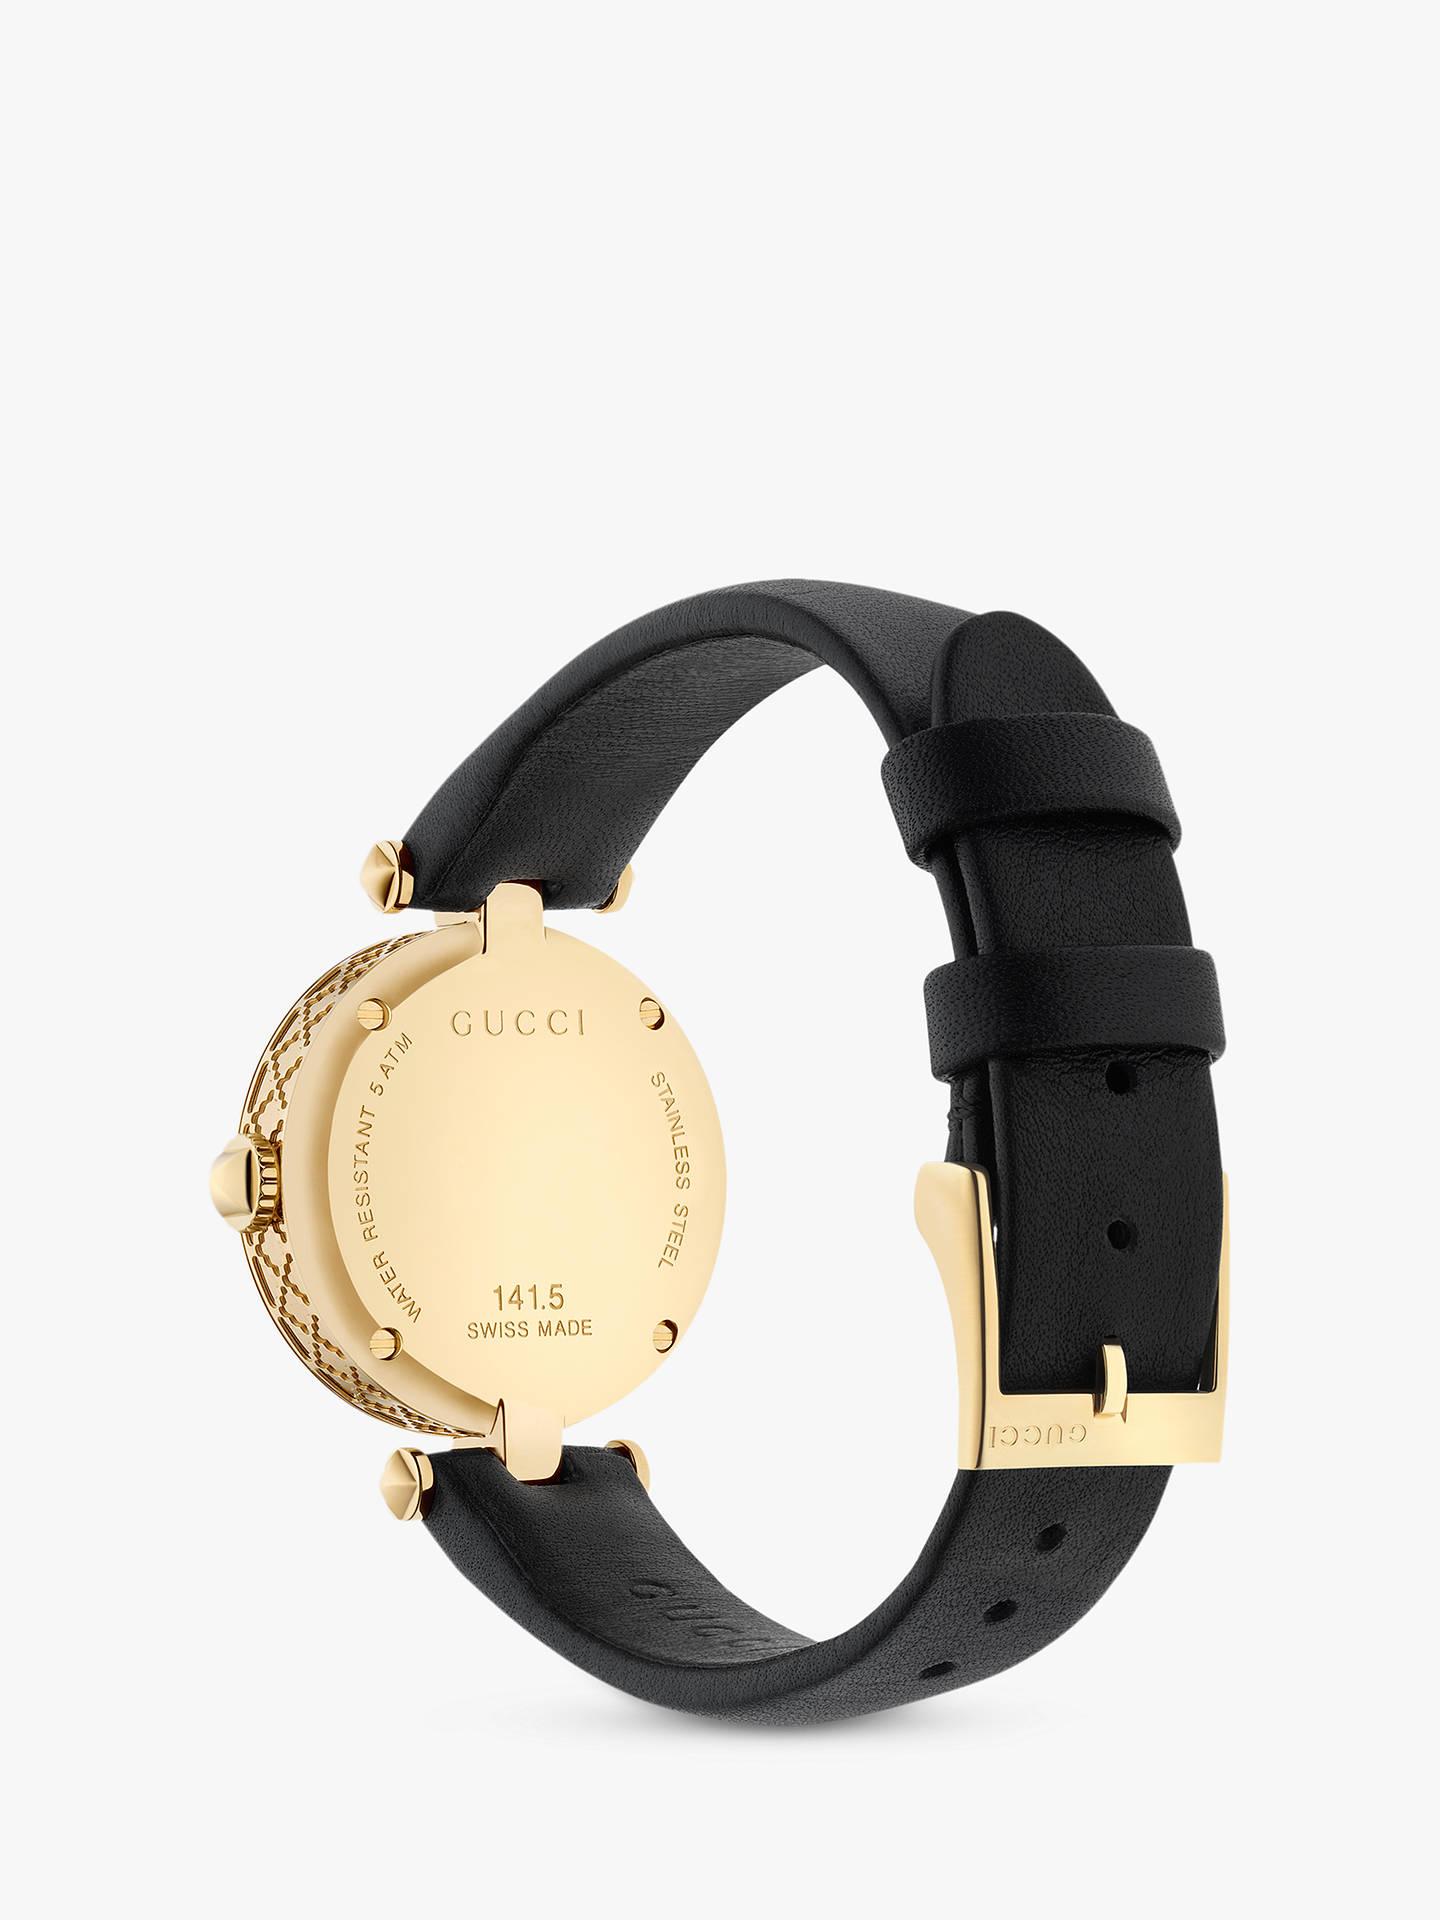 5ceb6aac Gucci YA141505 Women's Diamantissima Leather Strap Watch, Black/White